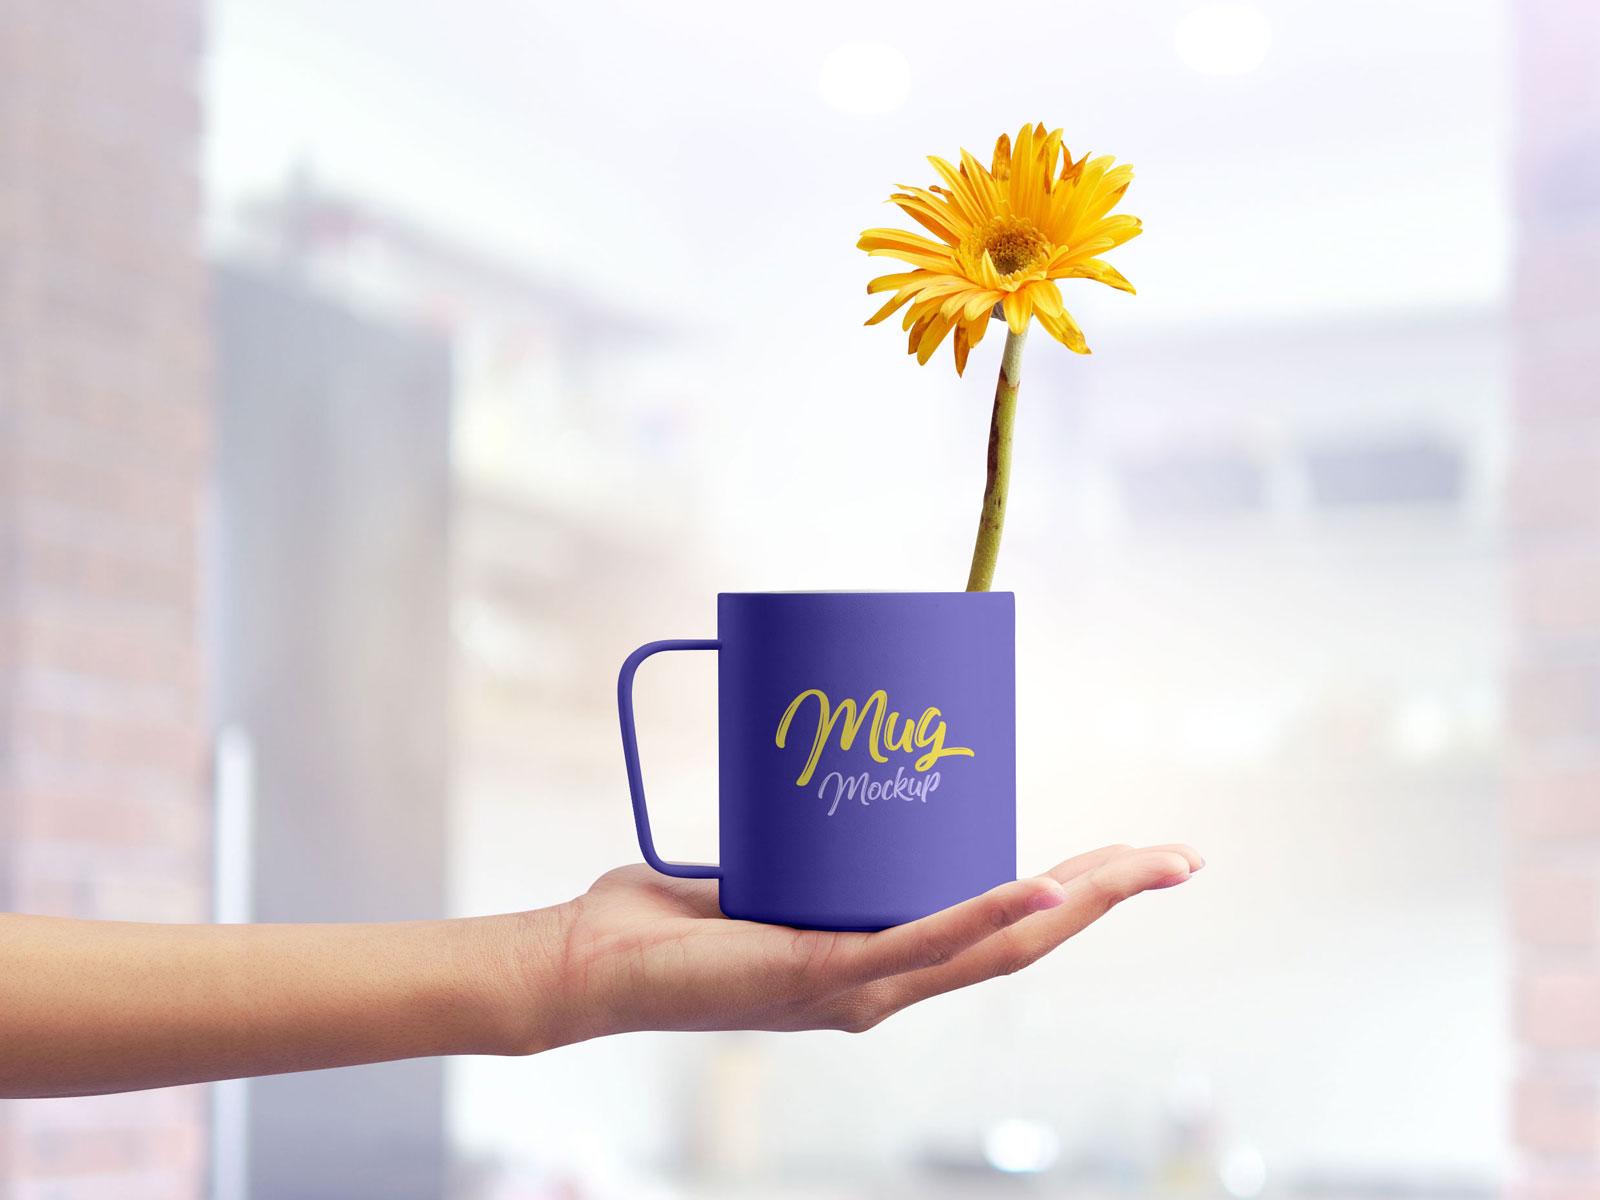 Free-Mug-on-Female-Hand-Mockup-PSD-2